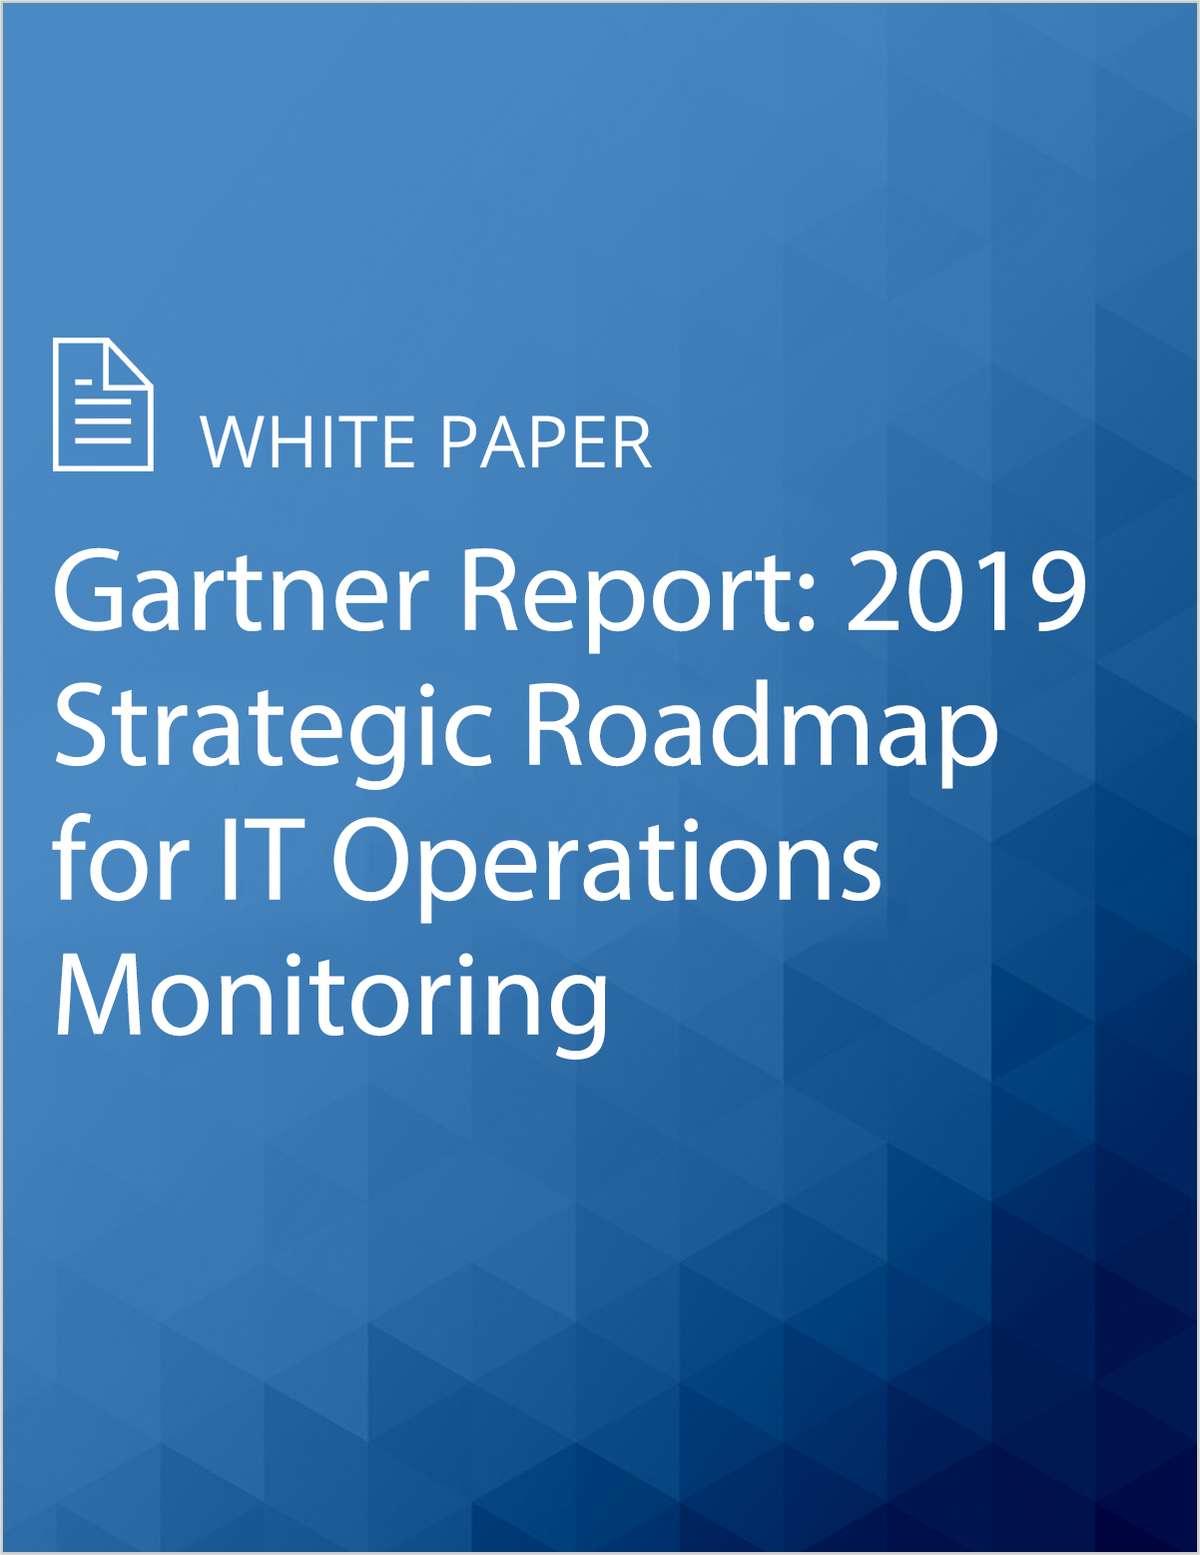 Gartner Report: 2019 Strategic Roadmap for IT Operations Monitoring